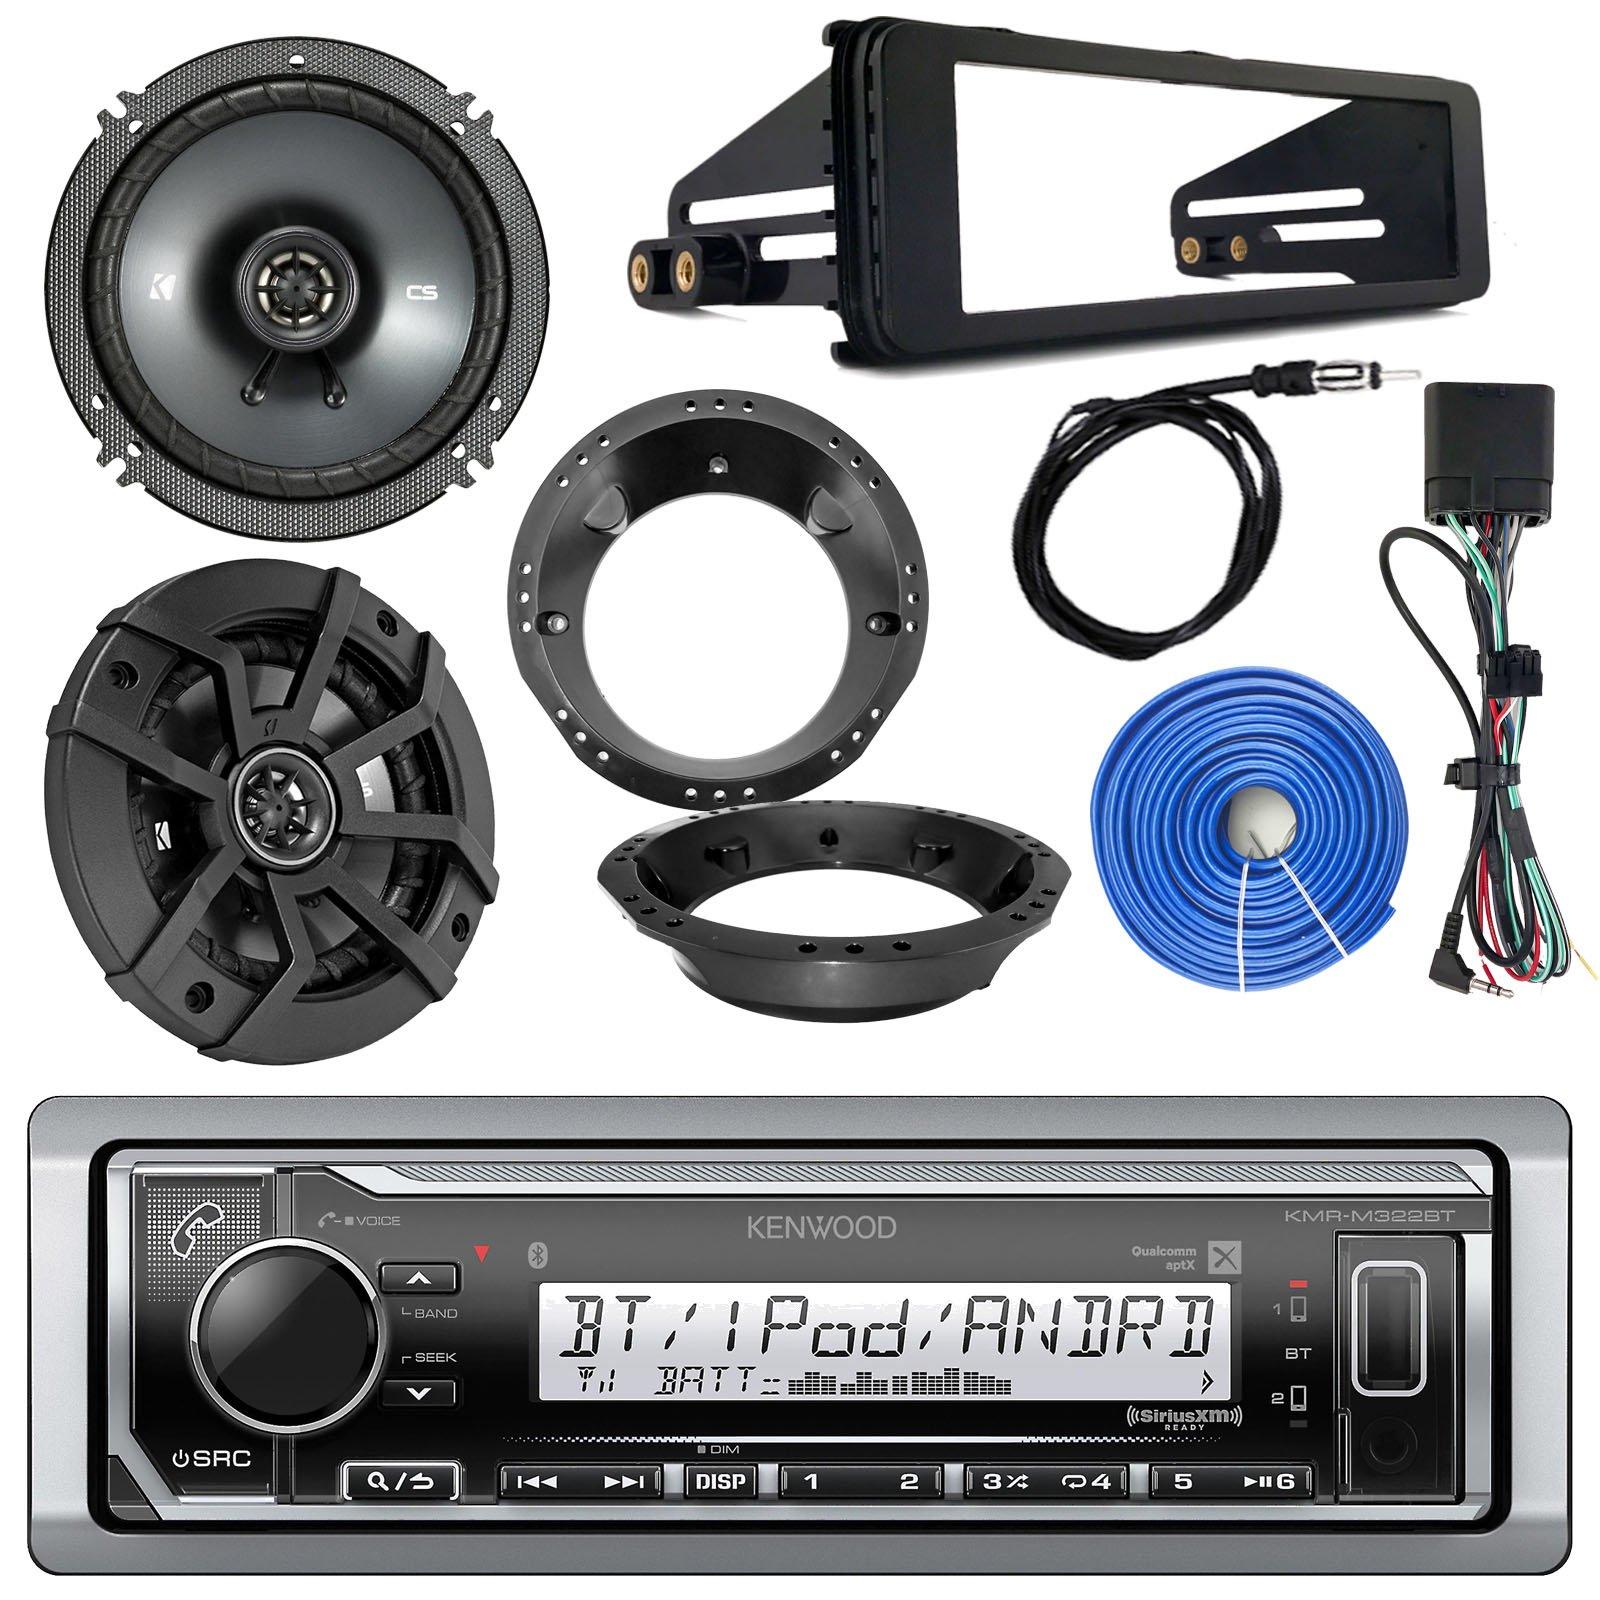 Kenwood Marine Digital Media Bluetooth Receiver, 2x Kicker 600-Watt 6.5'' Black Speakers, 1998-2013 Harley Speaker Mounting Ring Adapter, Single-DIN Stereo Installation Kit, 50 FT 14 AWG Wire, Antenna